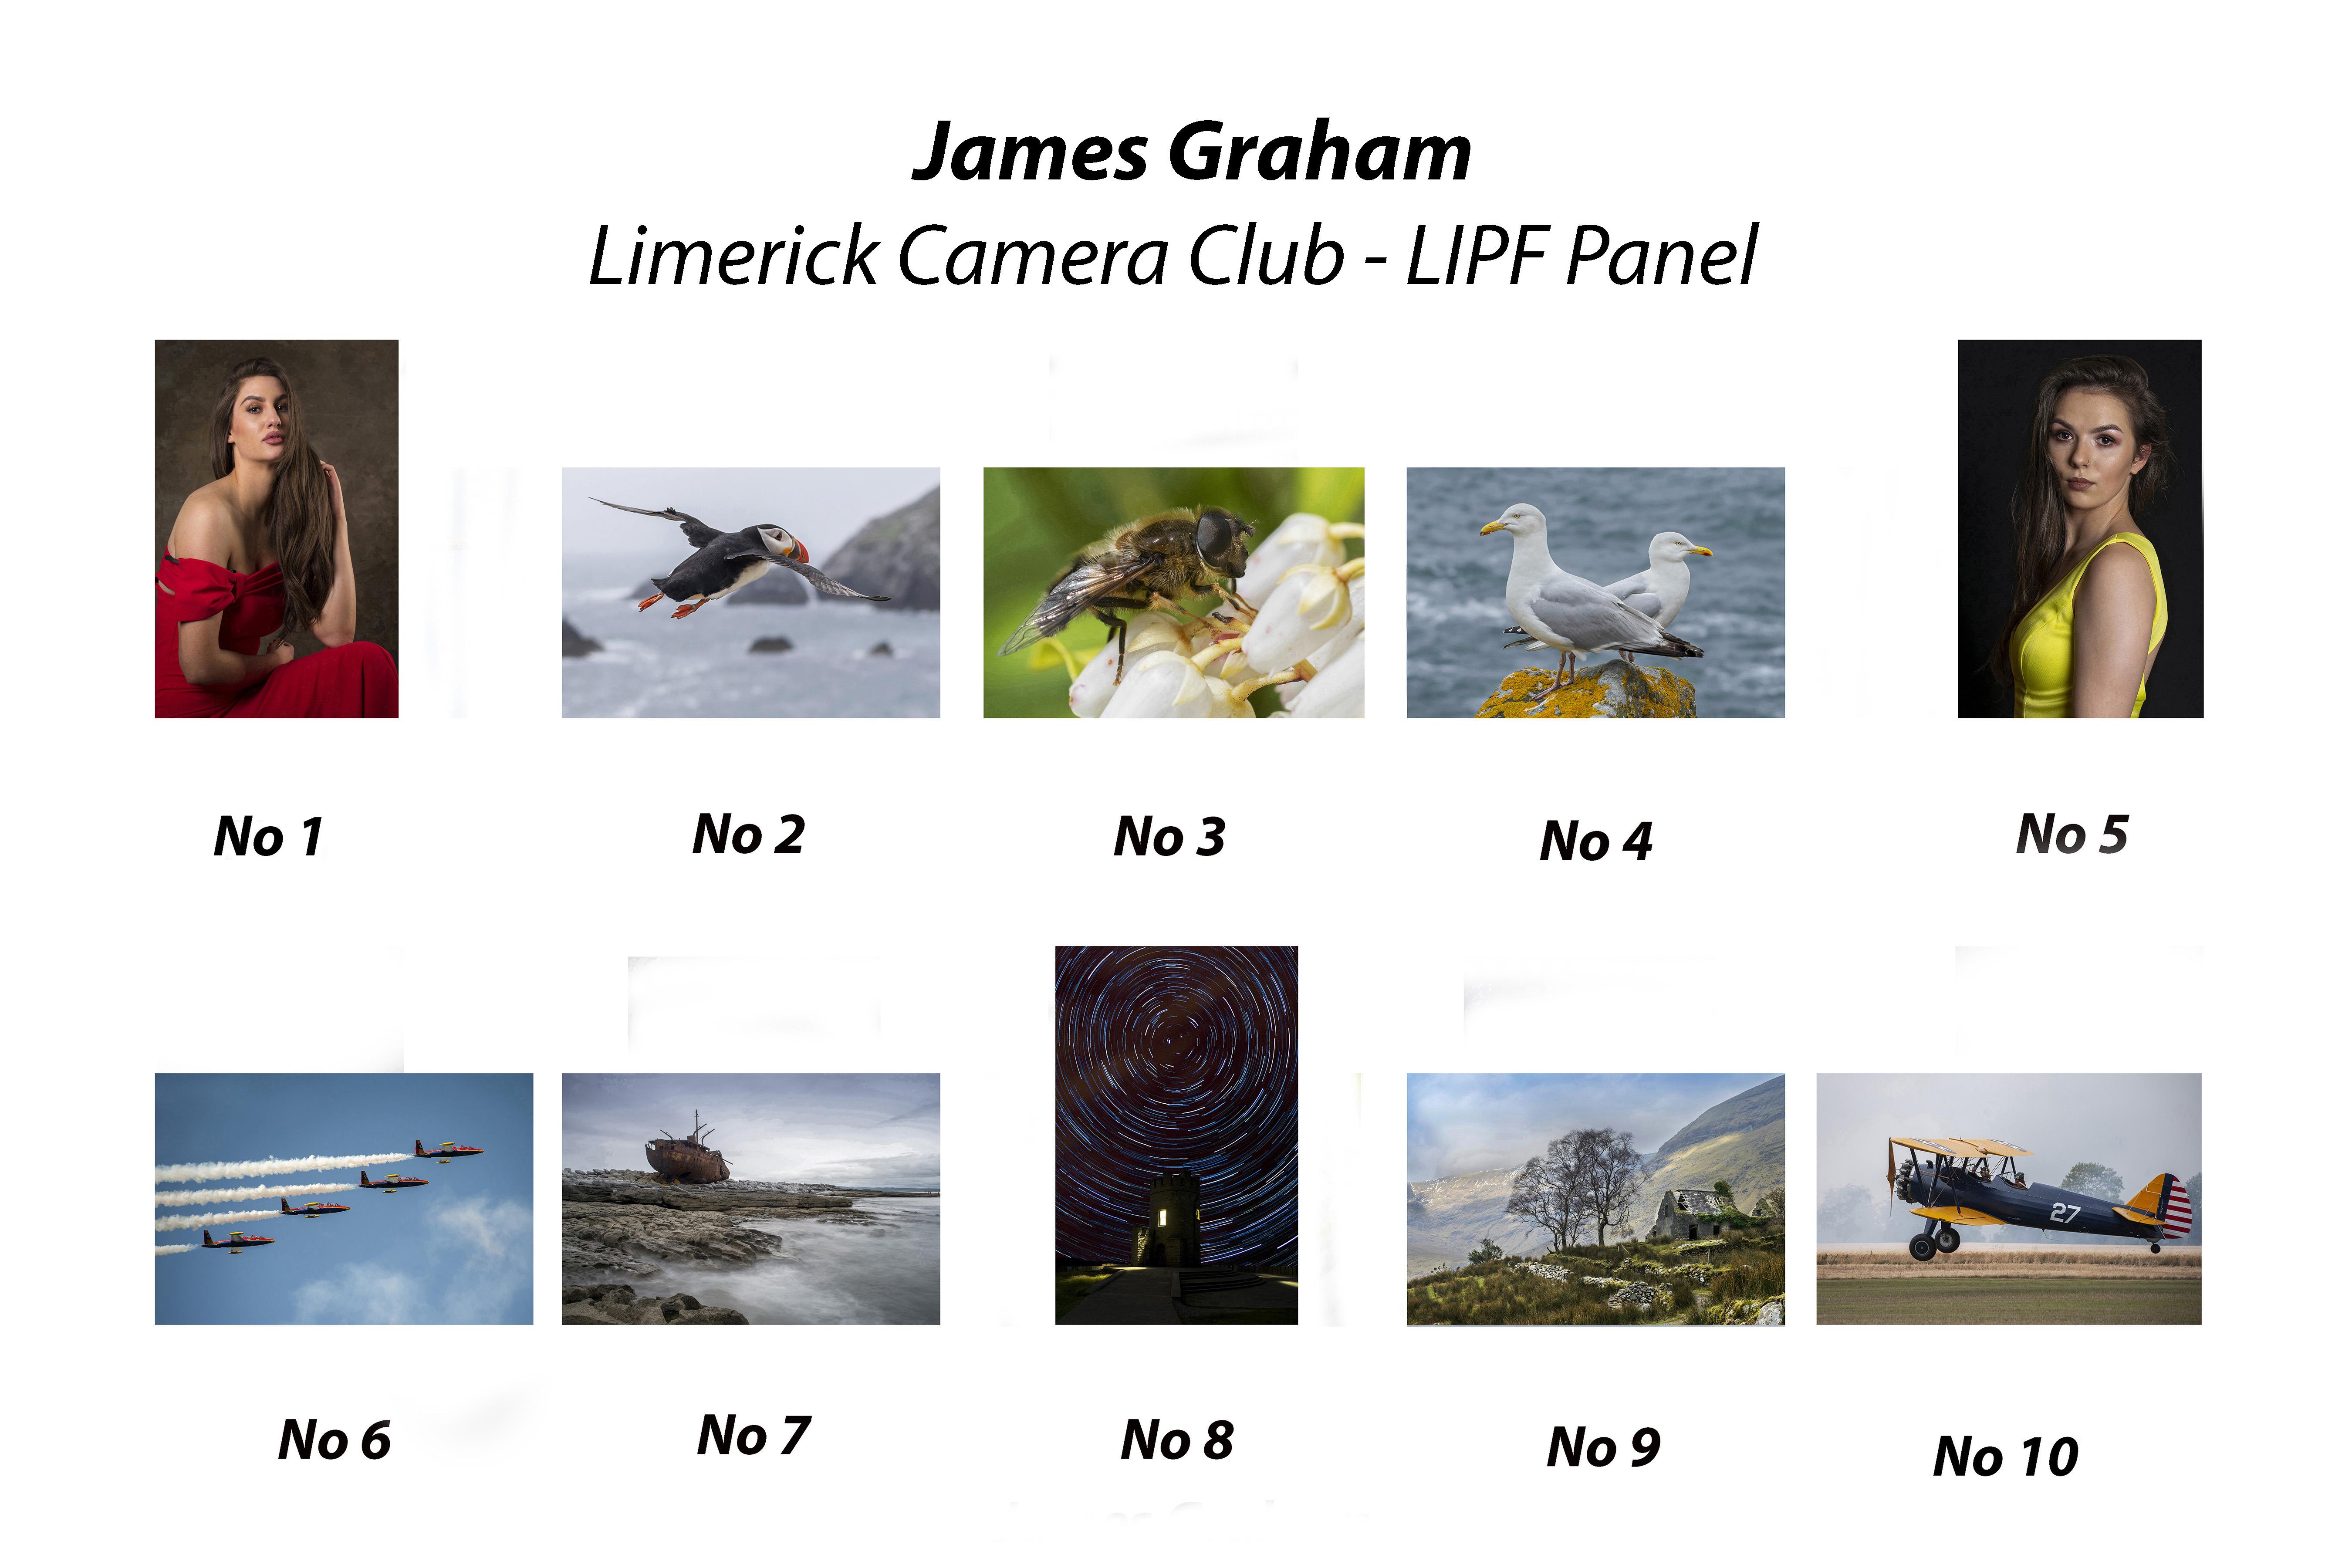 LIPF PANEL James Graham